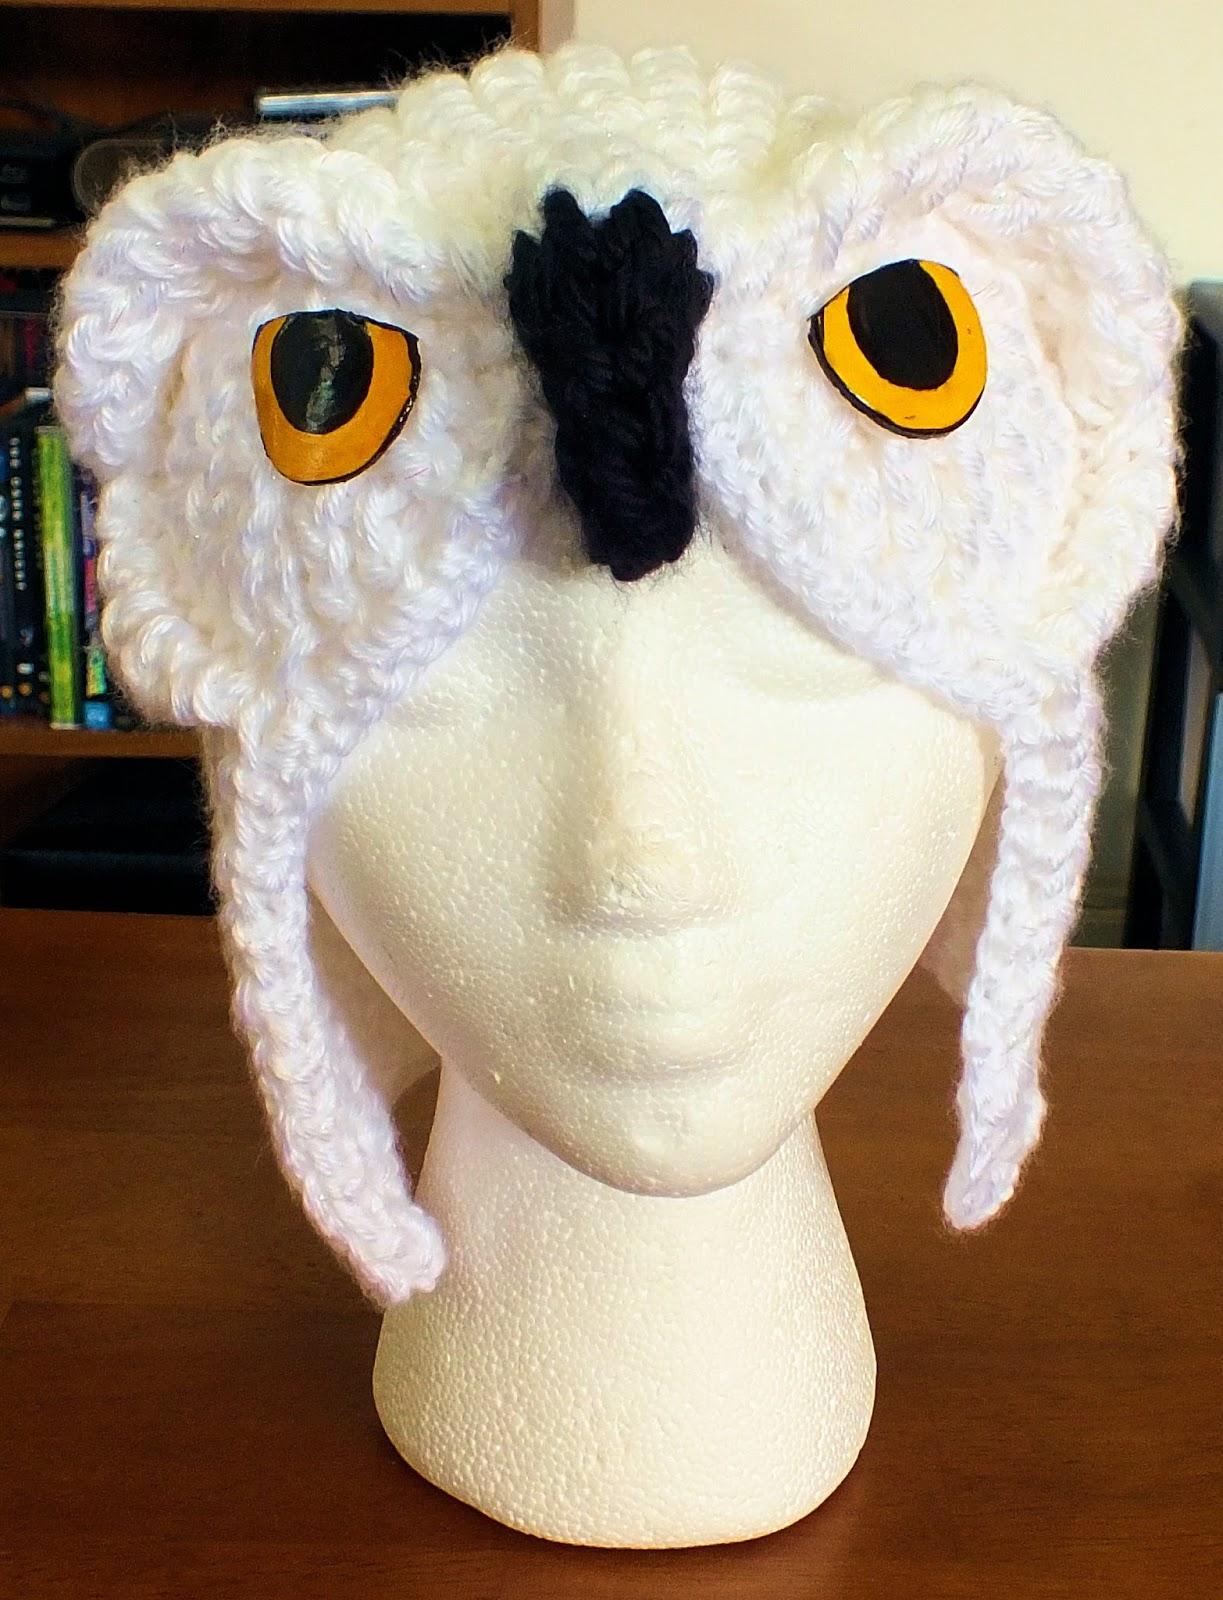 36 Peg Loom Knitting Patterns : Premium Knitting Looms by: CinDWood Crafts: Loom, Yarn, Gauge, Swatch..... What?